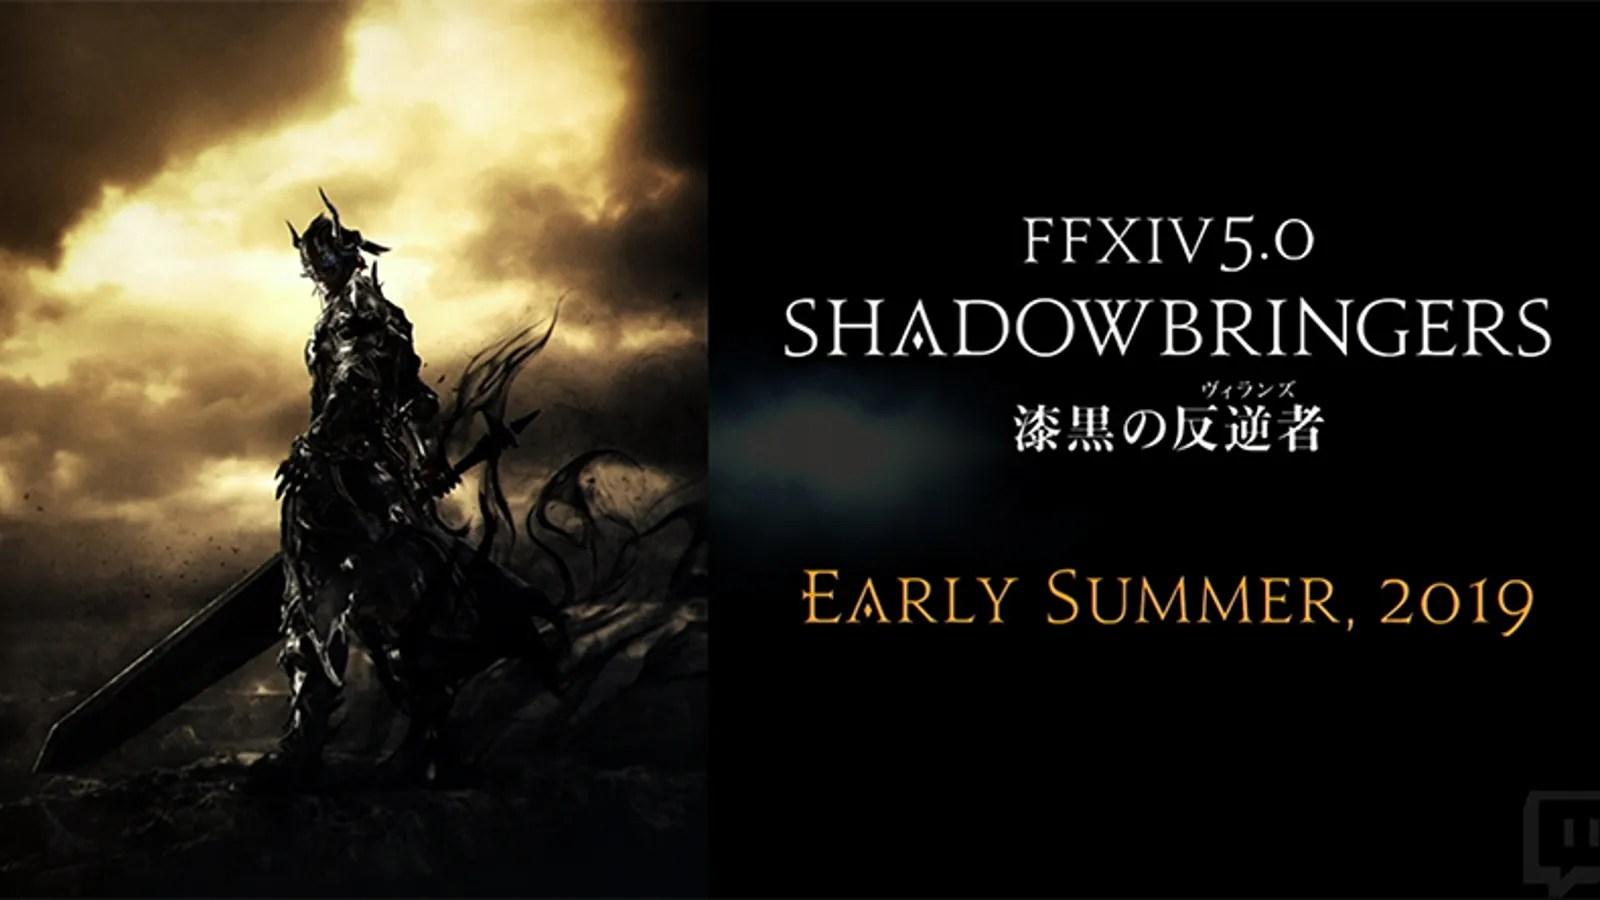 Final Fantasy XIVs Next Expansion Is Shadowbringers